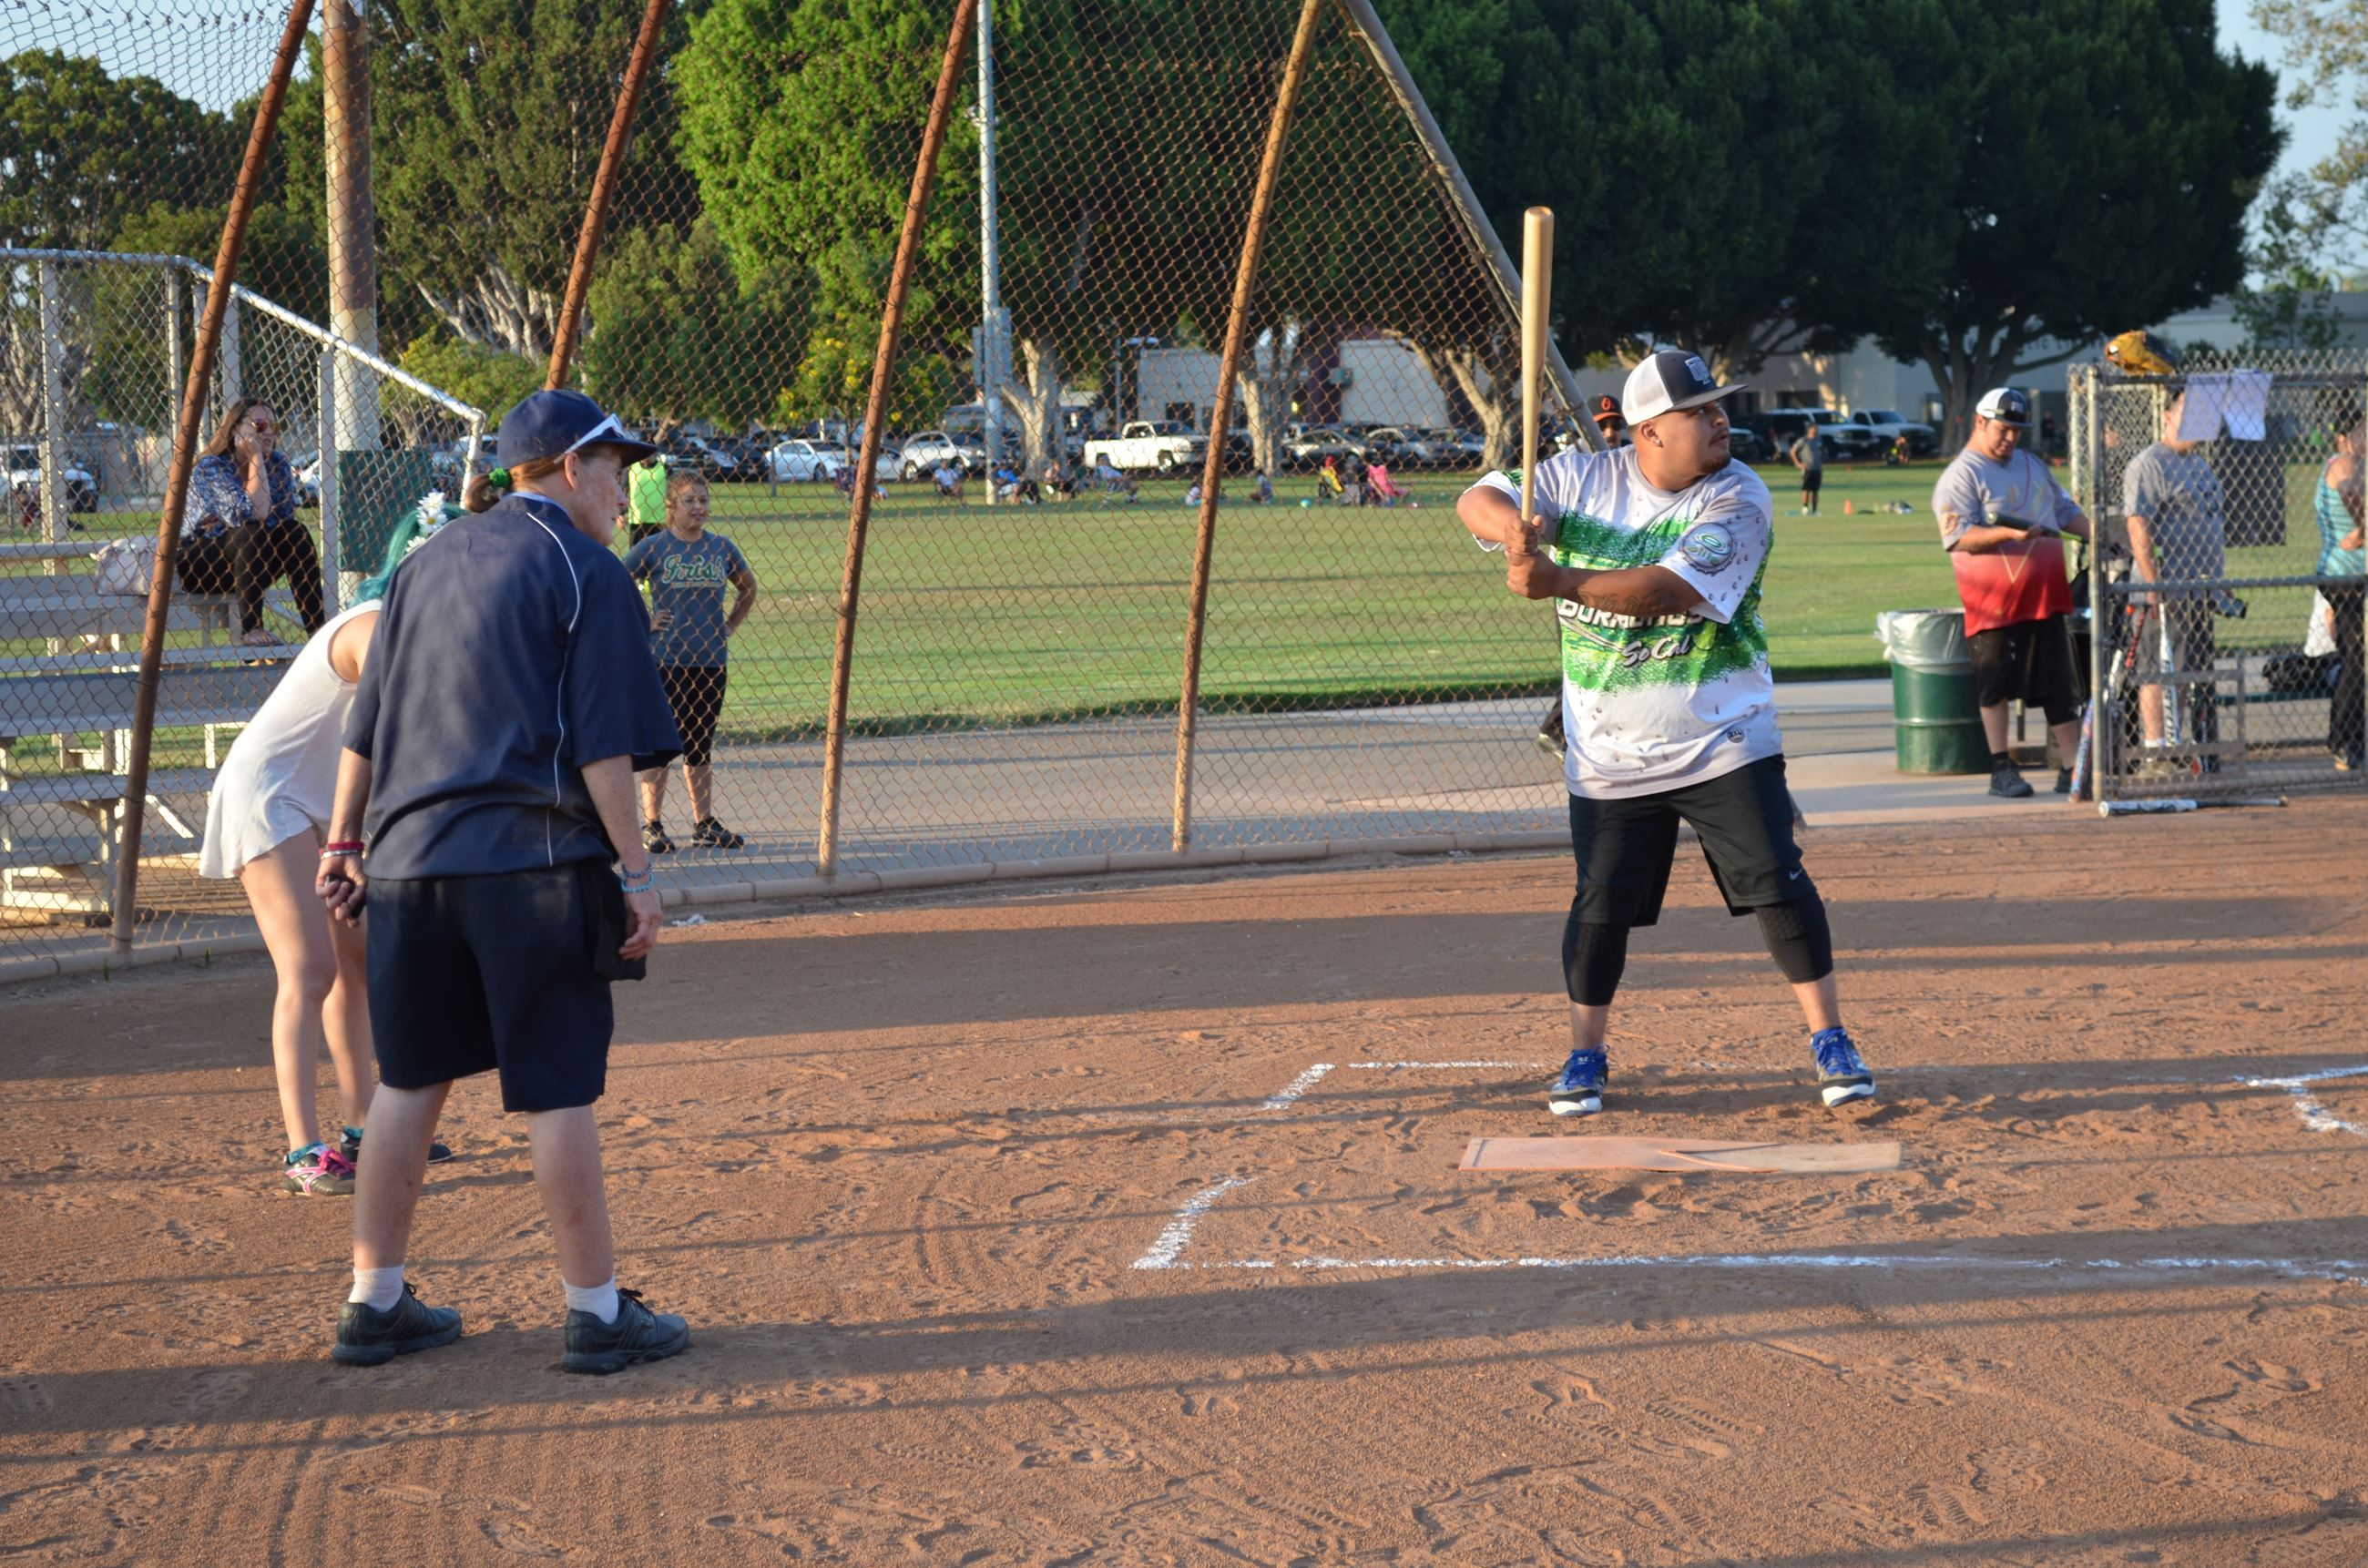 Softball Leagues | Anaheim, CA - Official Website